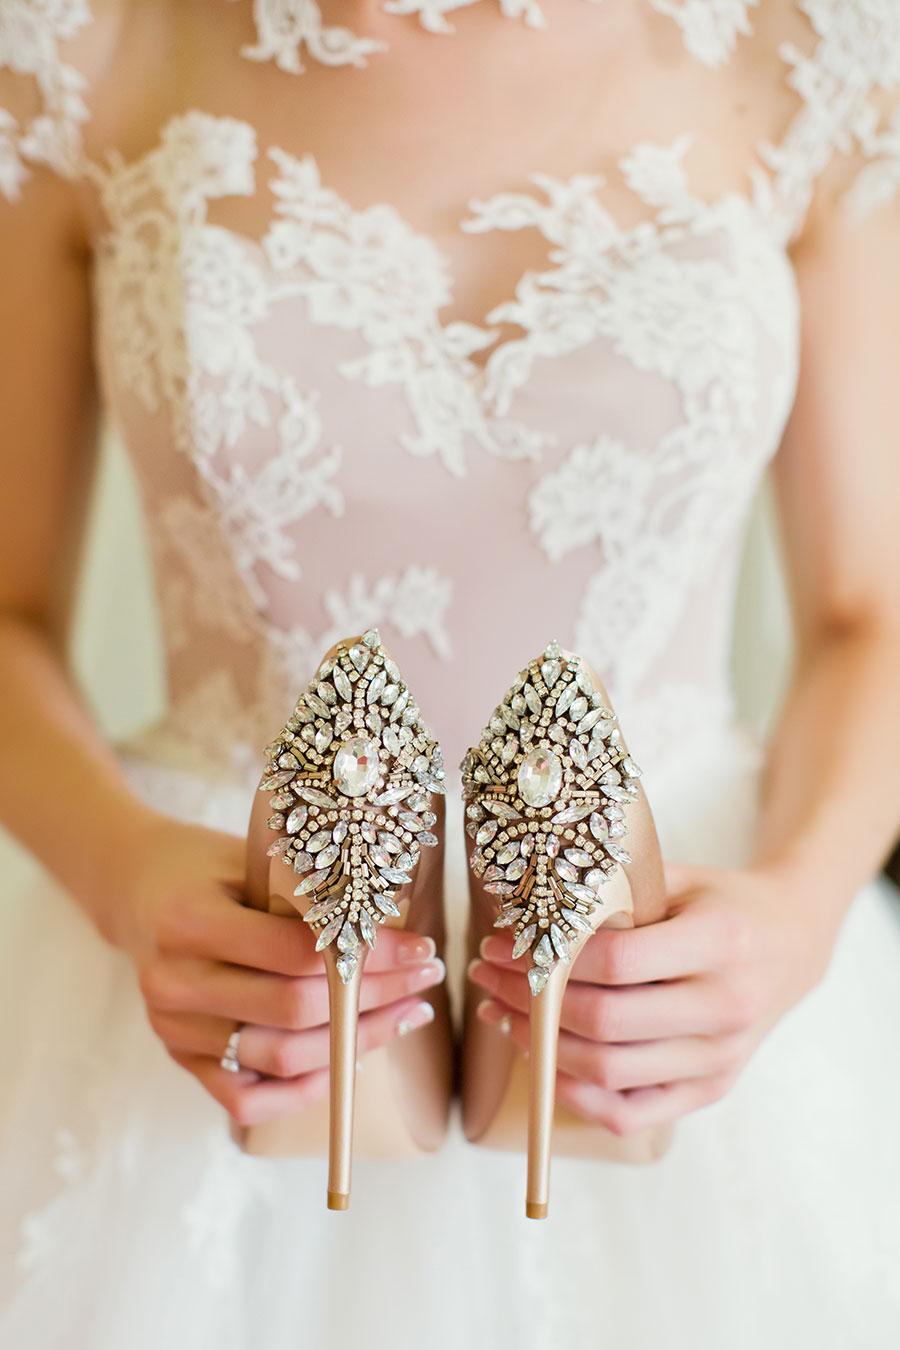 peachromanceinspo_shoes | Omaha Lace Cleaners